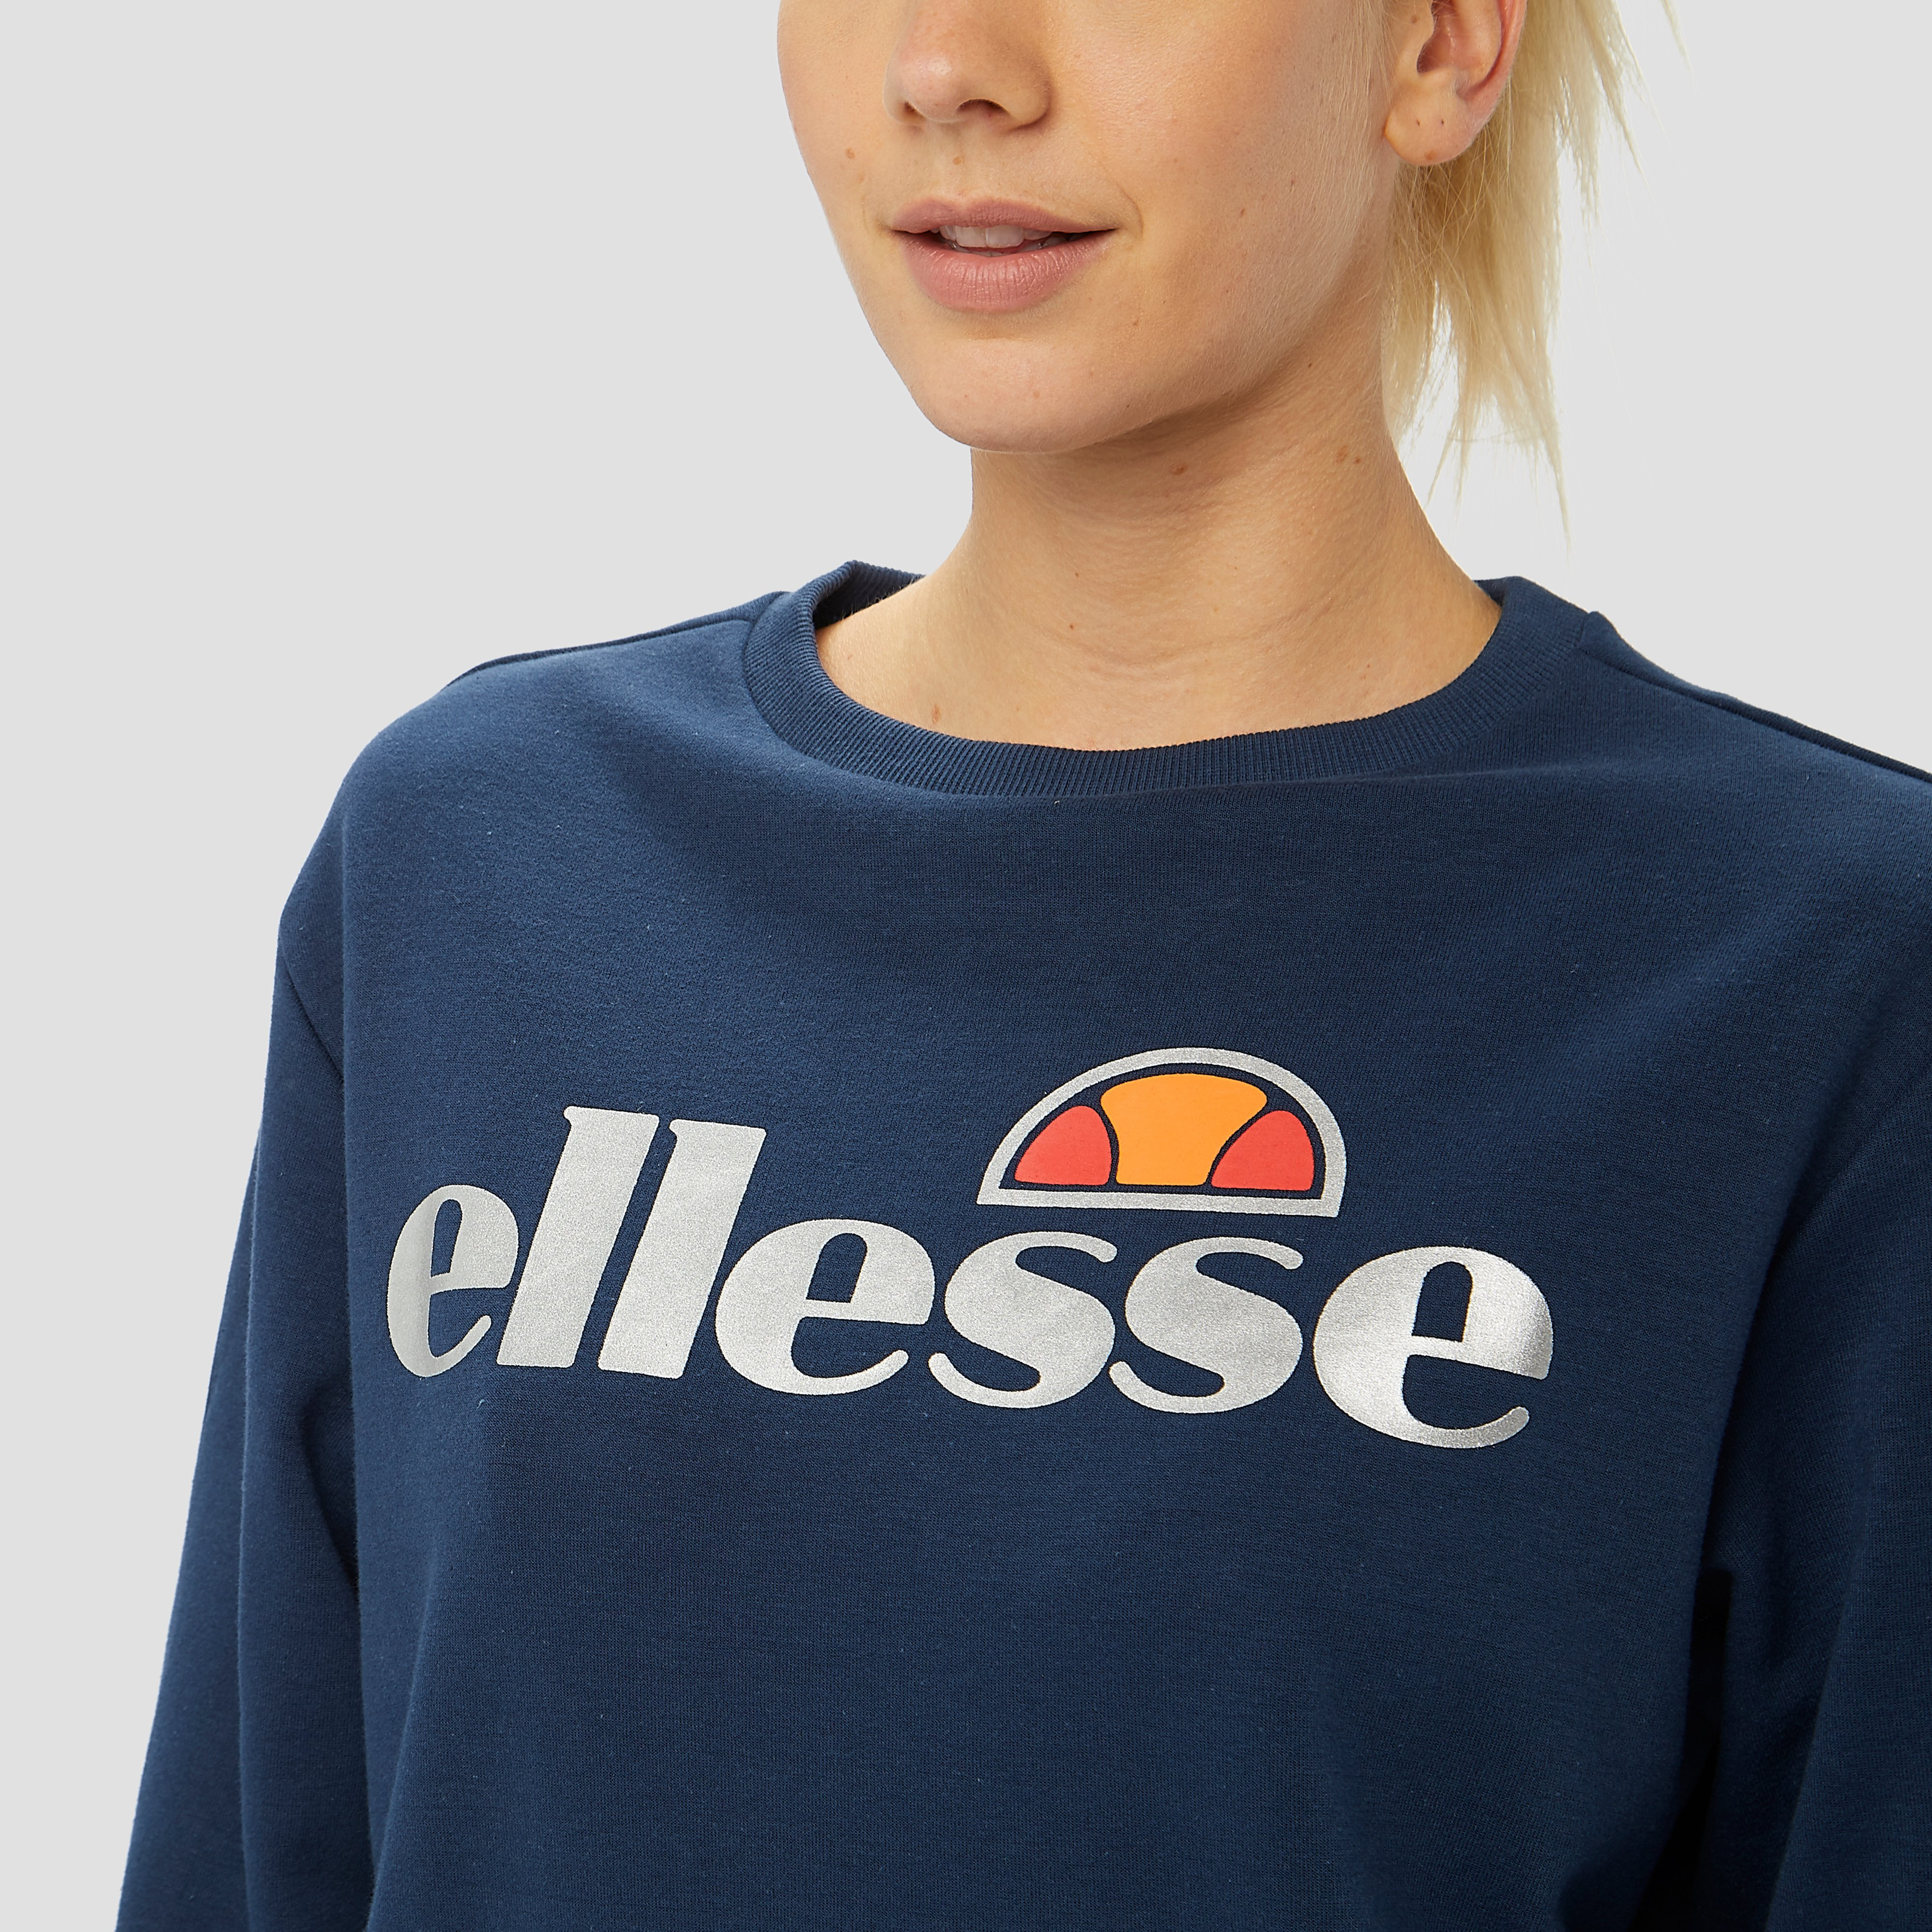 ELLESSE WINONA CREW SWEATER BLAUW DAMES